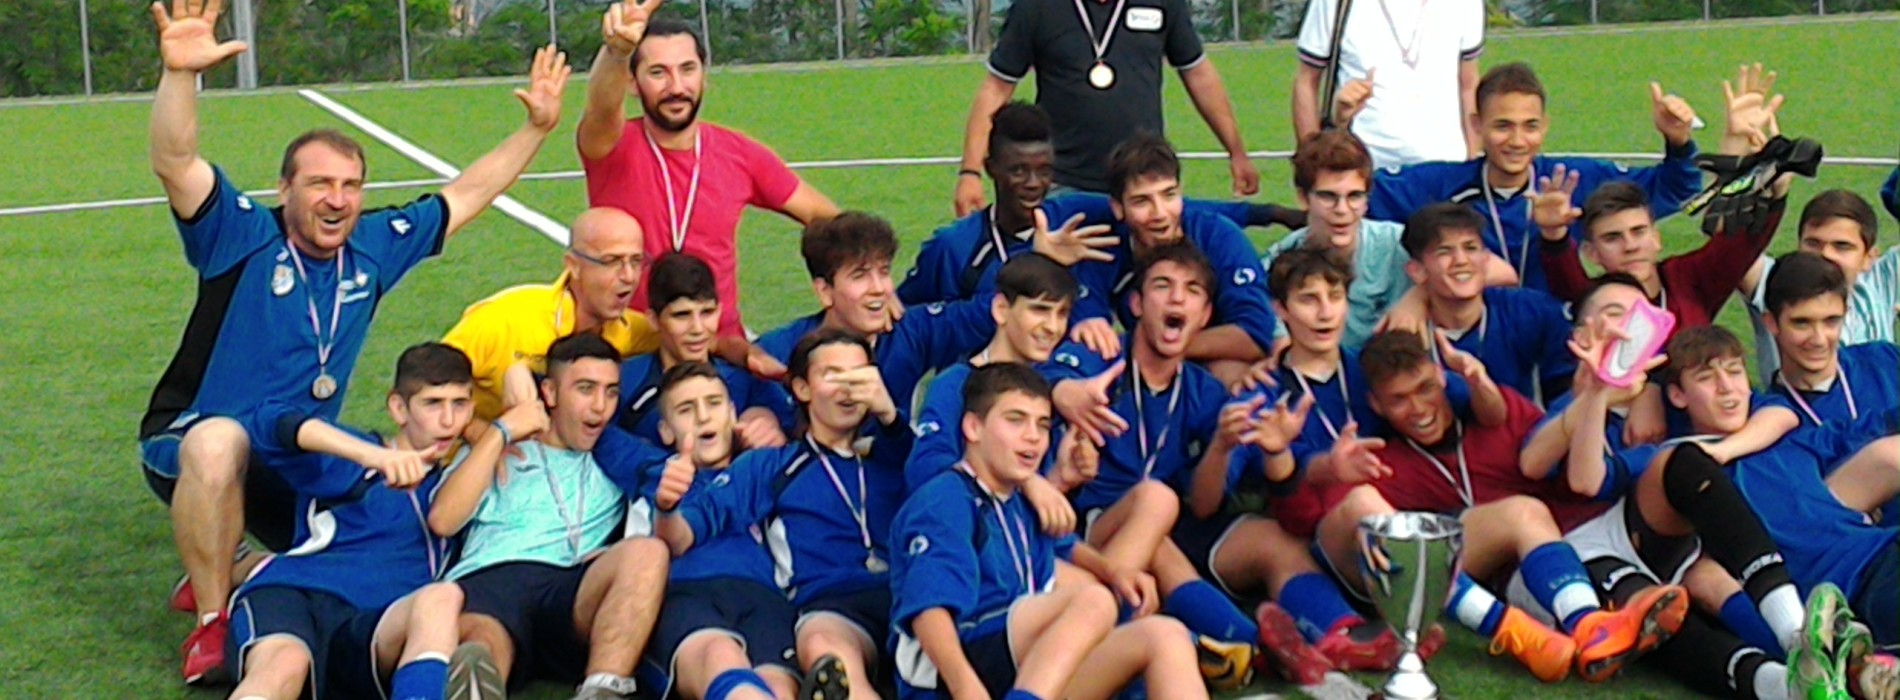 Coppe Regionali Allievi e Giovanissimi: trionfano Virtus Avigliano e Matheola Matera